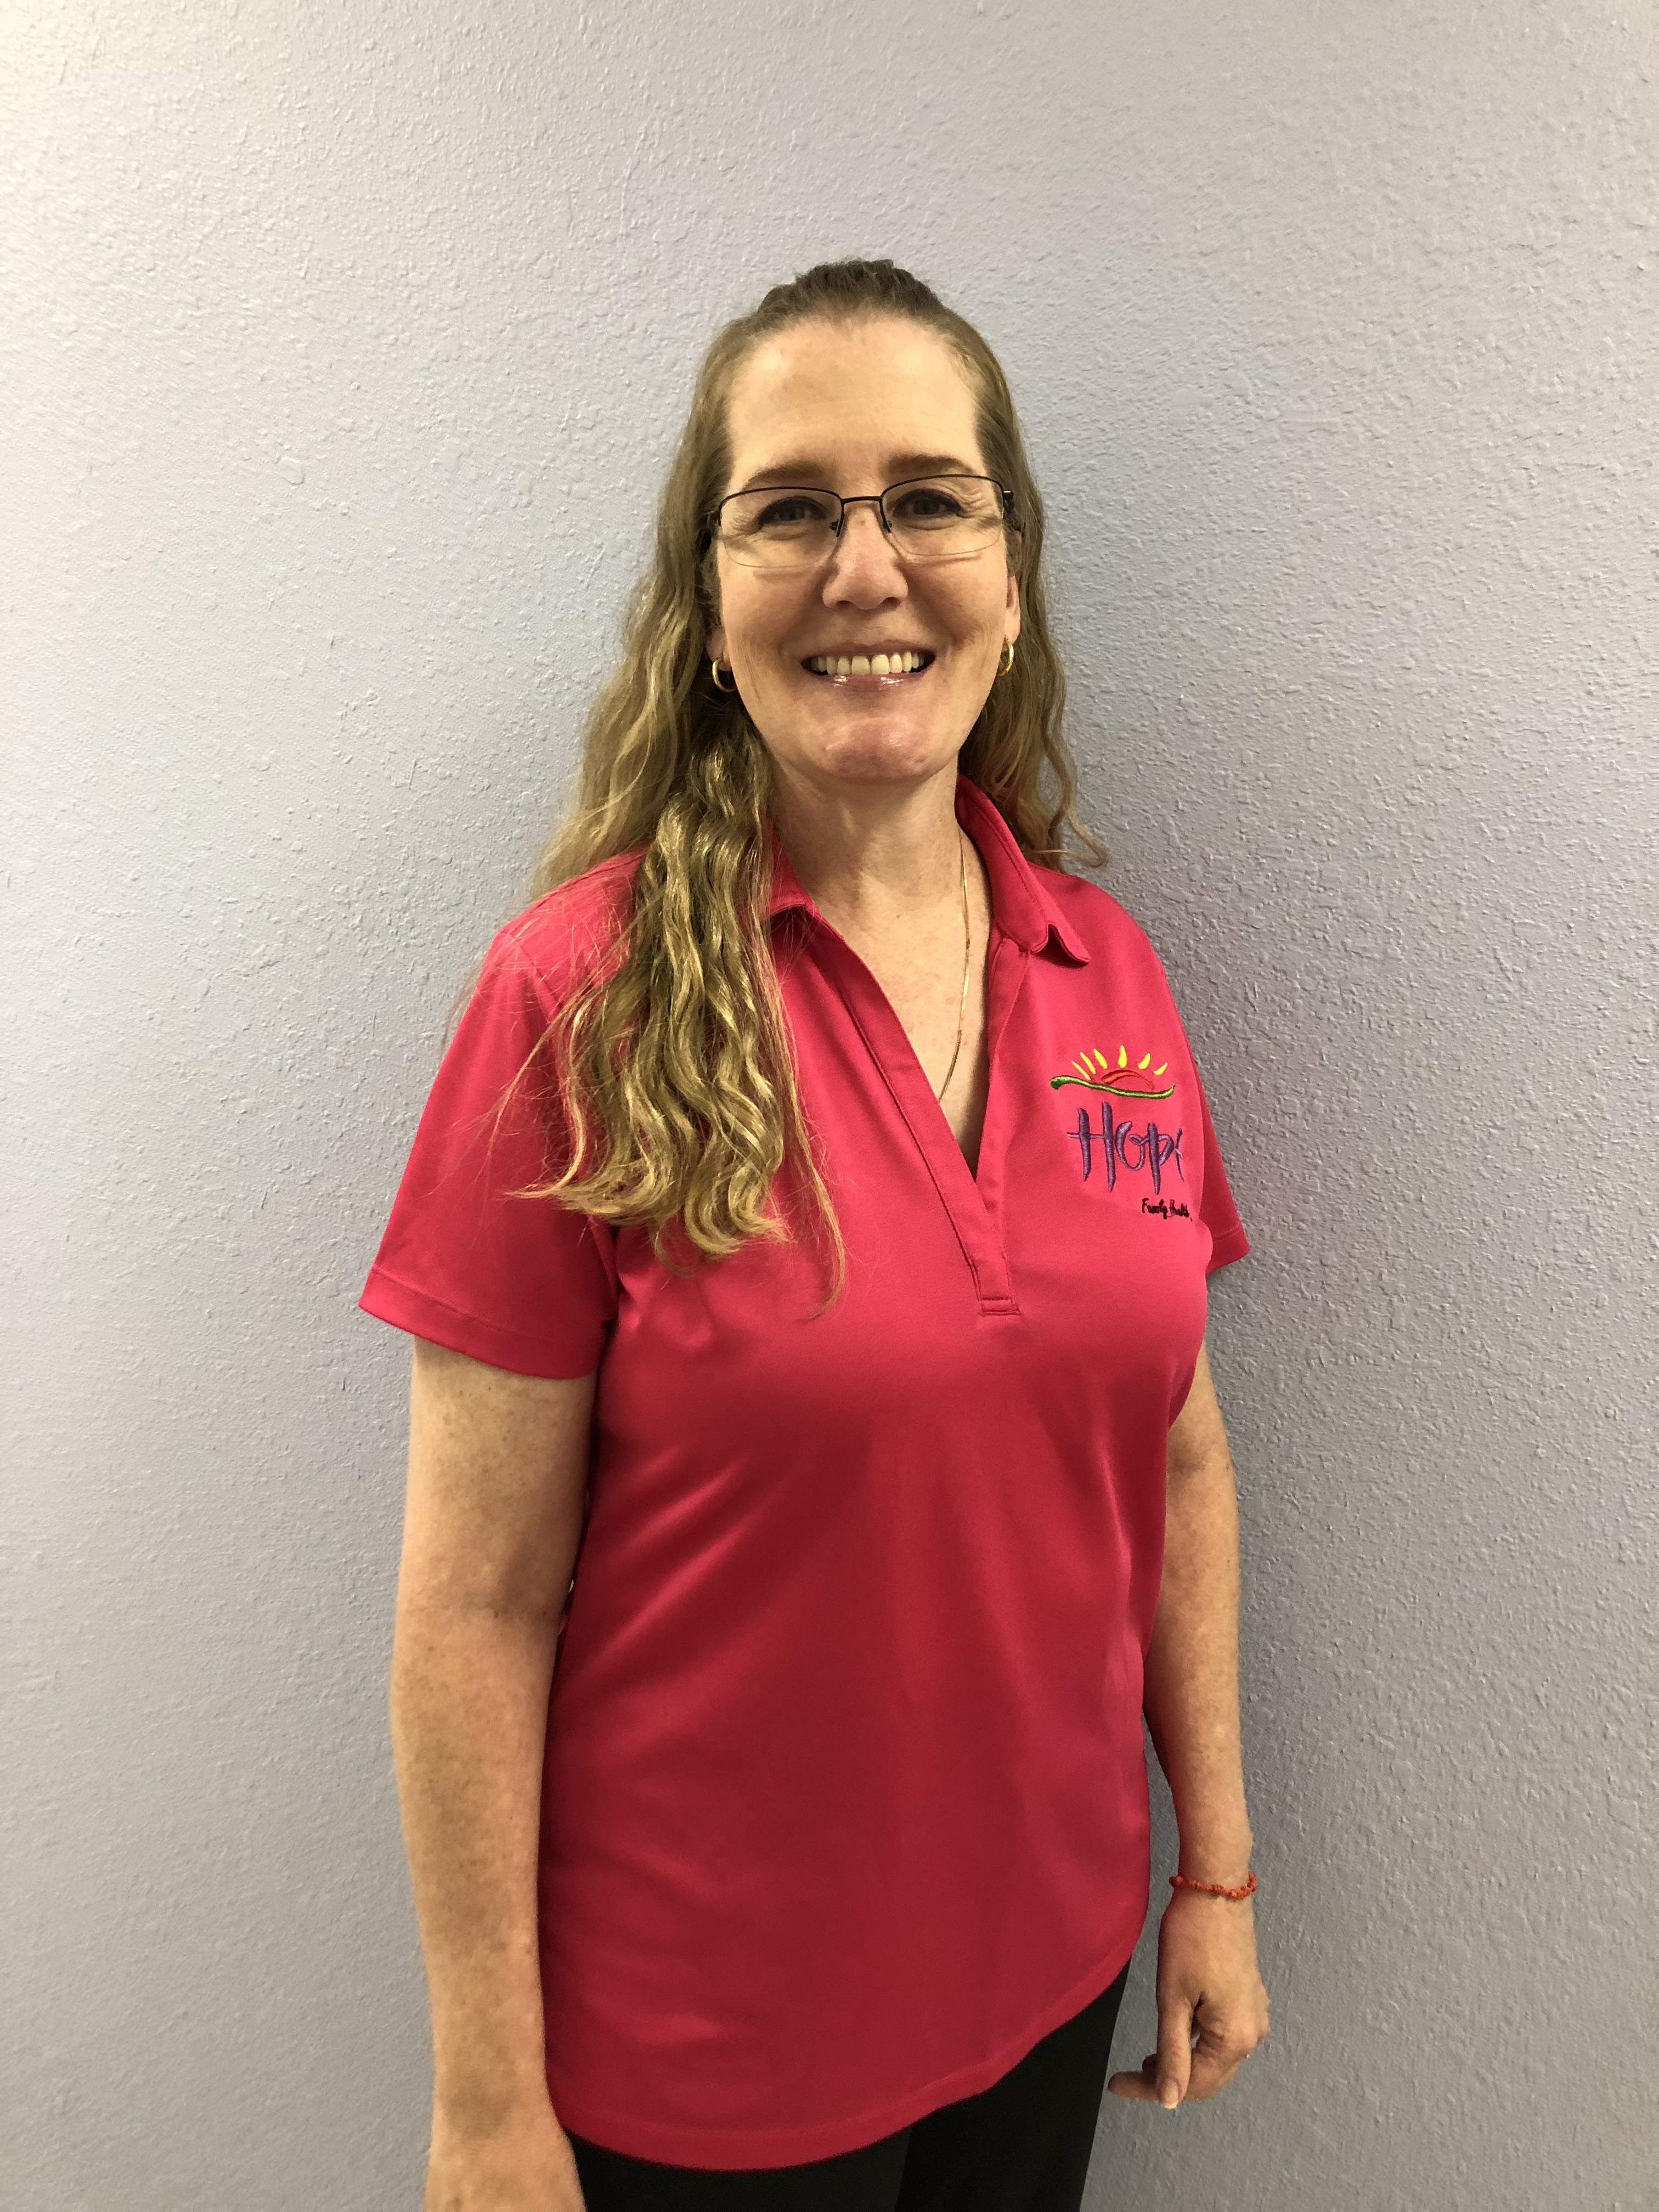 Kathy De Leon, Bookkeeper, Grant Assistant